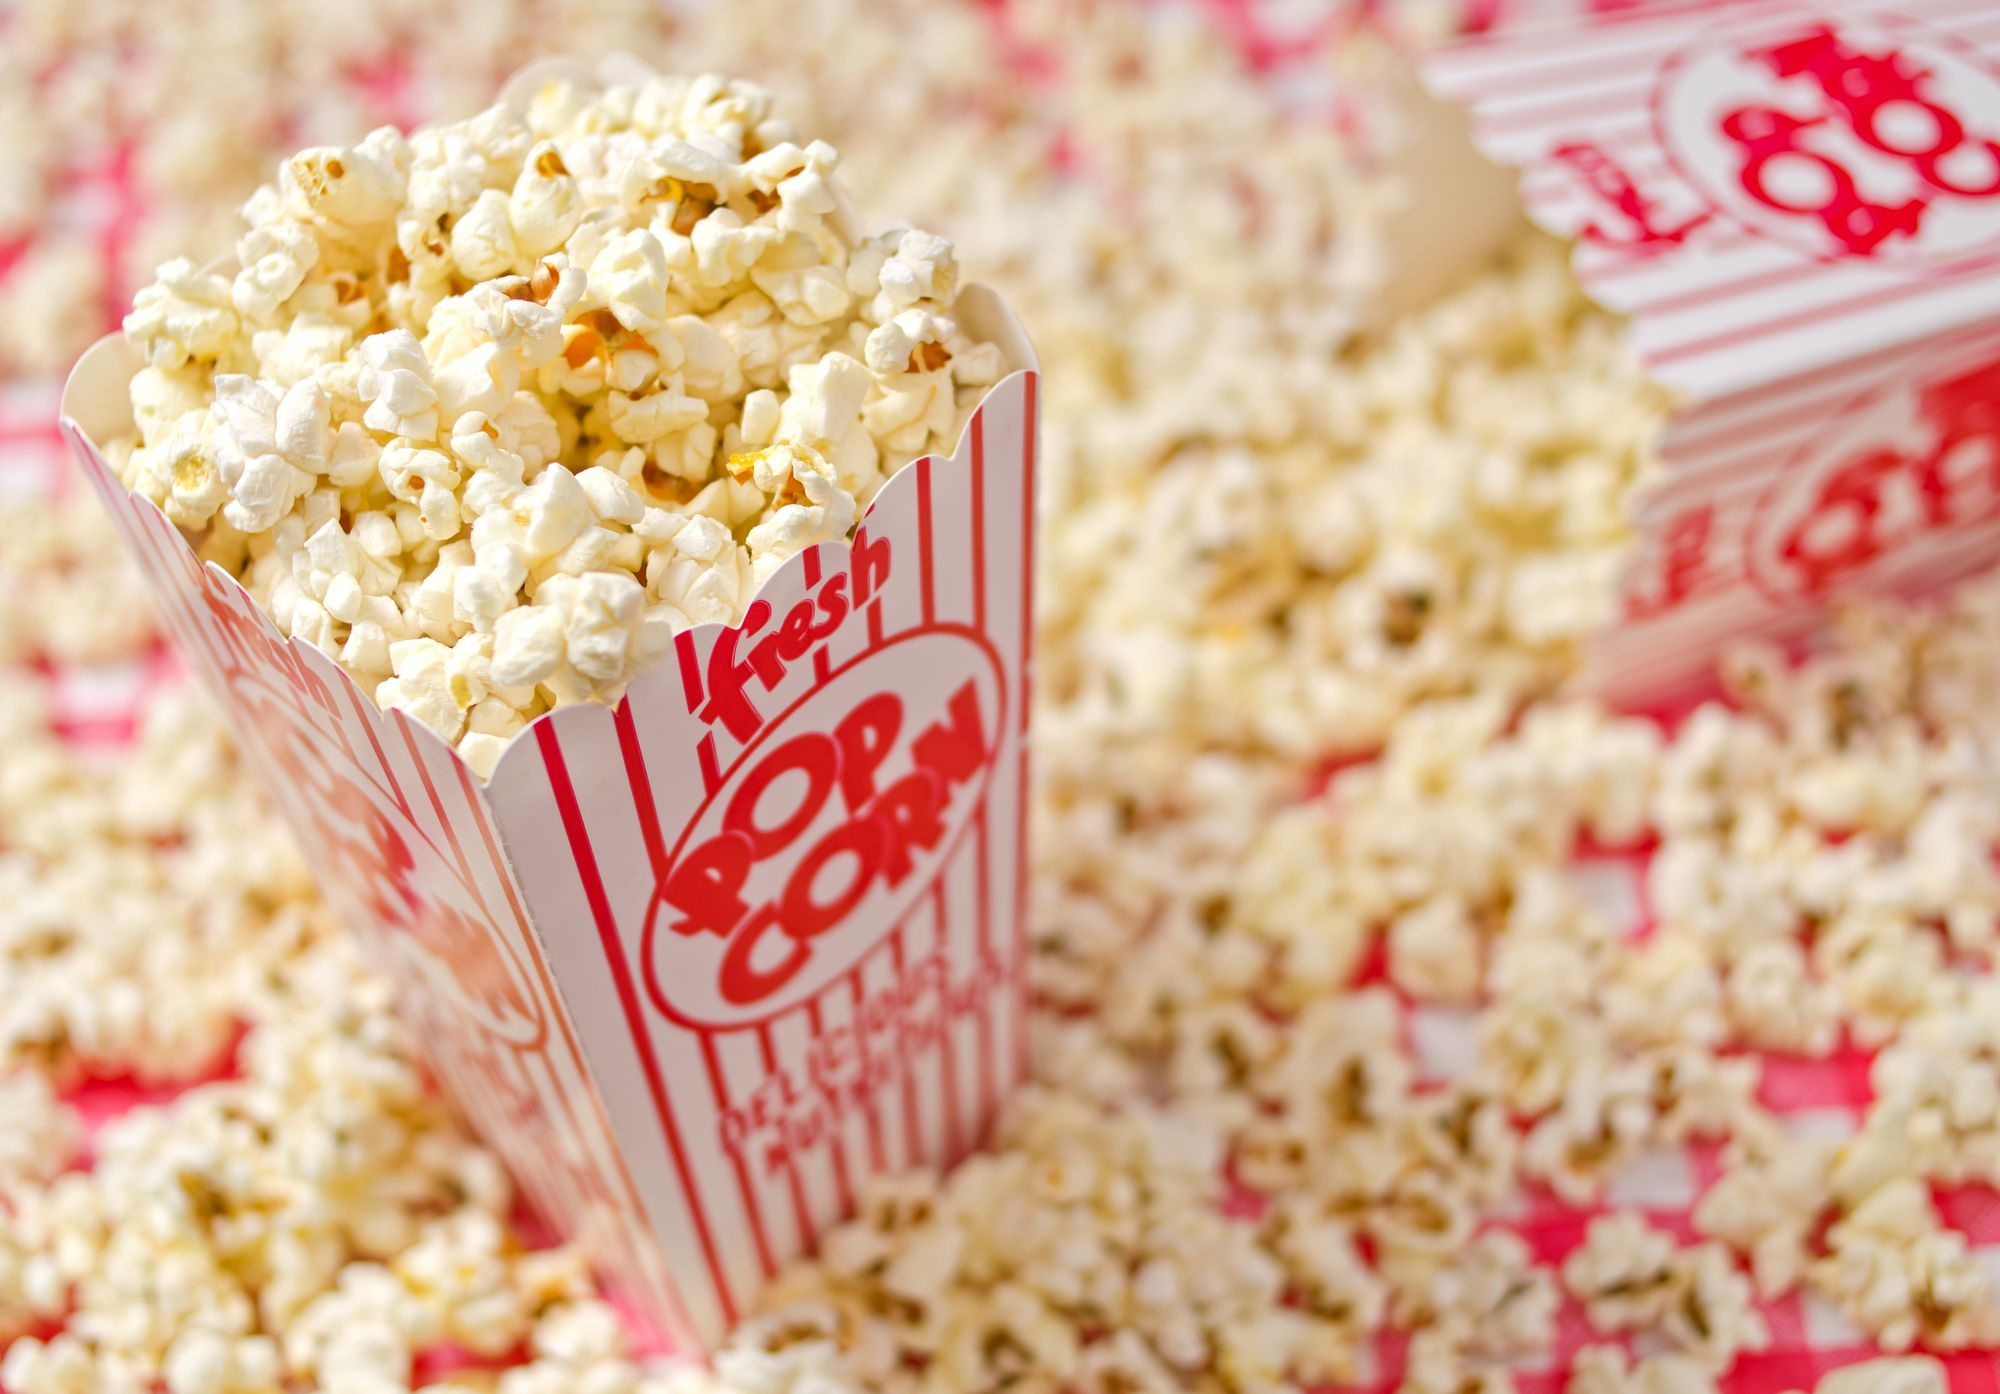 Yummy buttery popcorn